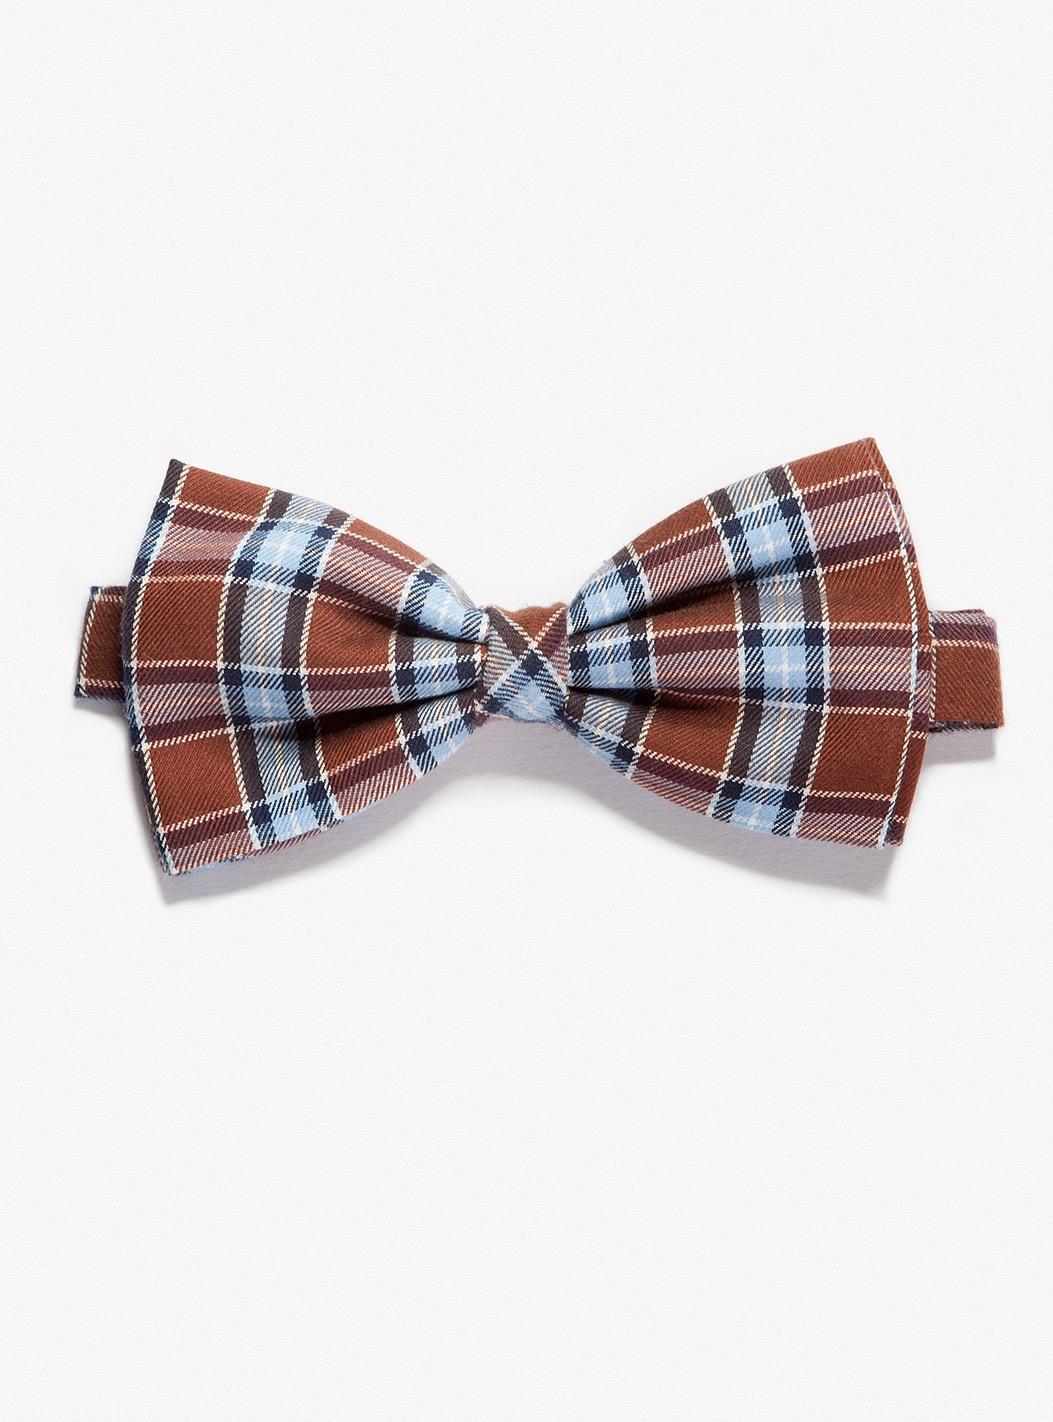 2397bf9e73b9 ARVO Brown-azure tartan ready-tied flannel Bow tie – Welcome on ...